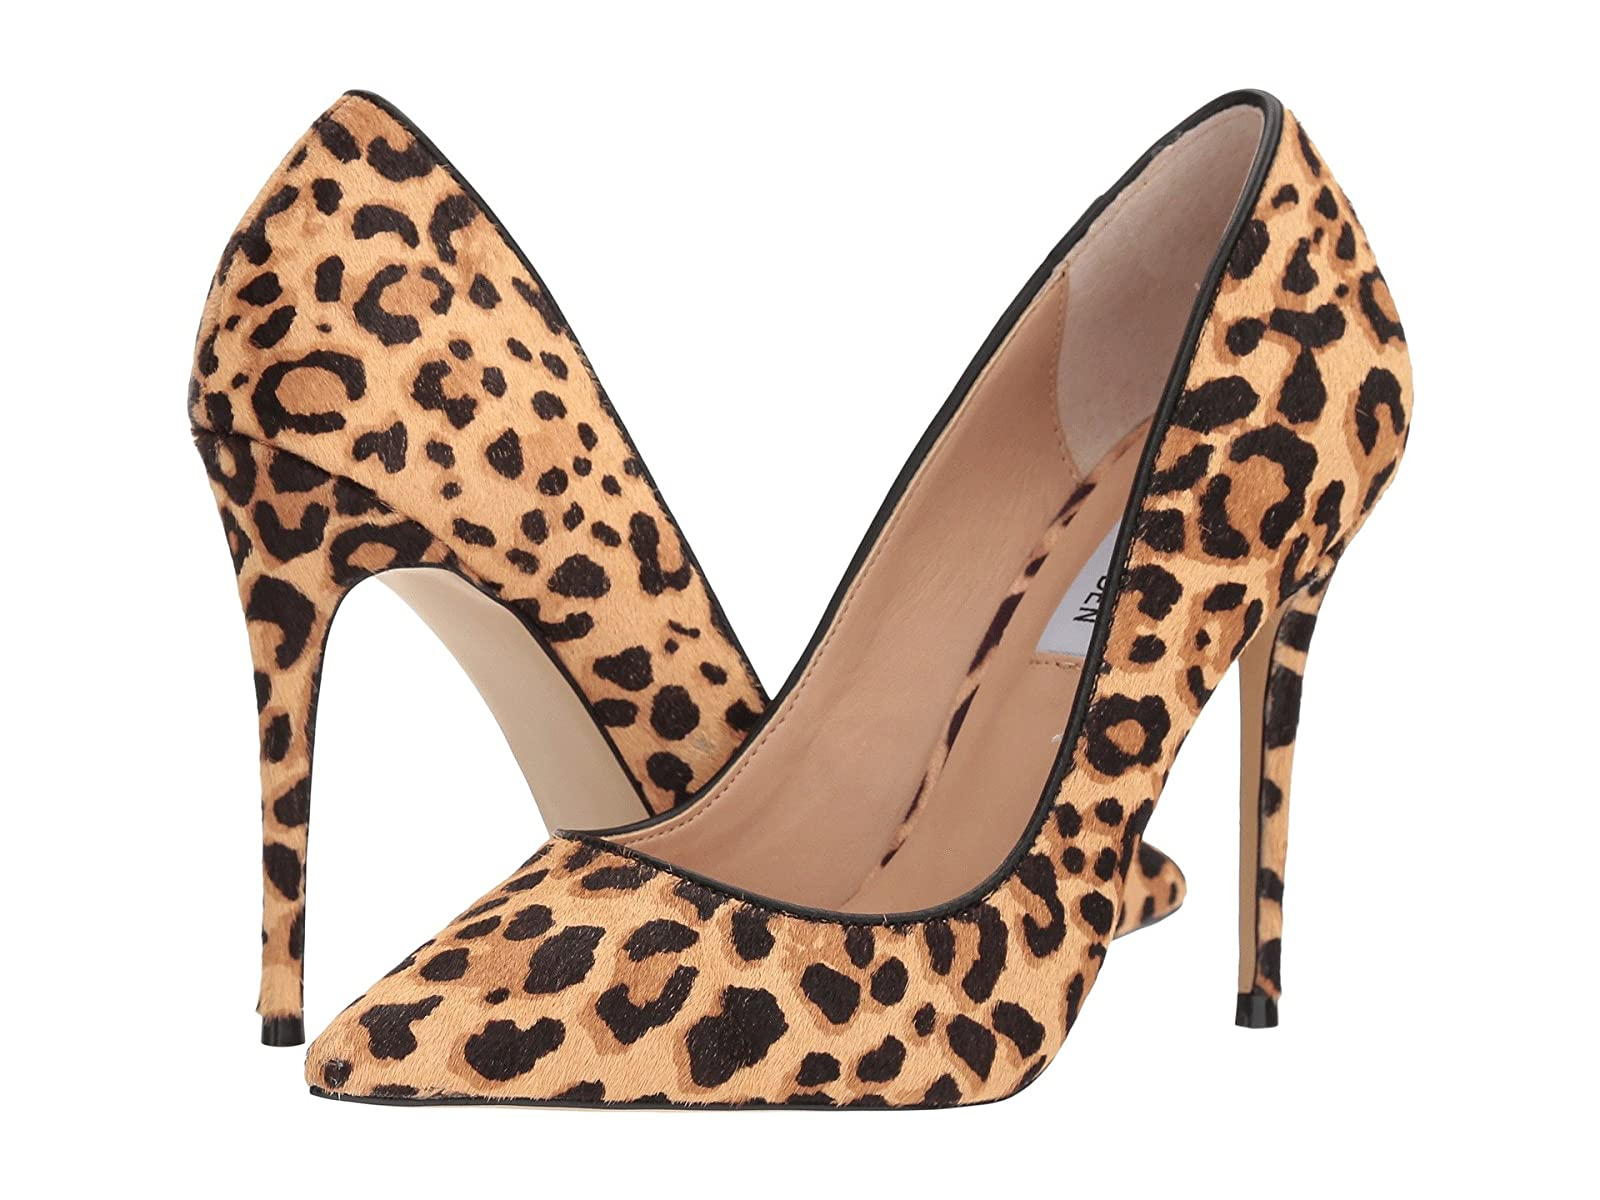 Steve Madden Daisie-L PumpAtmospheric grades have affordable shoes